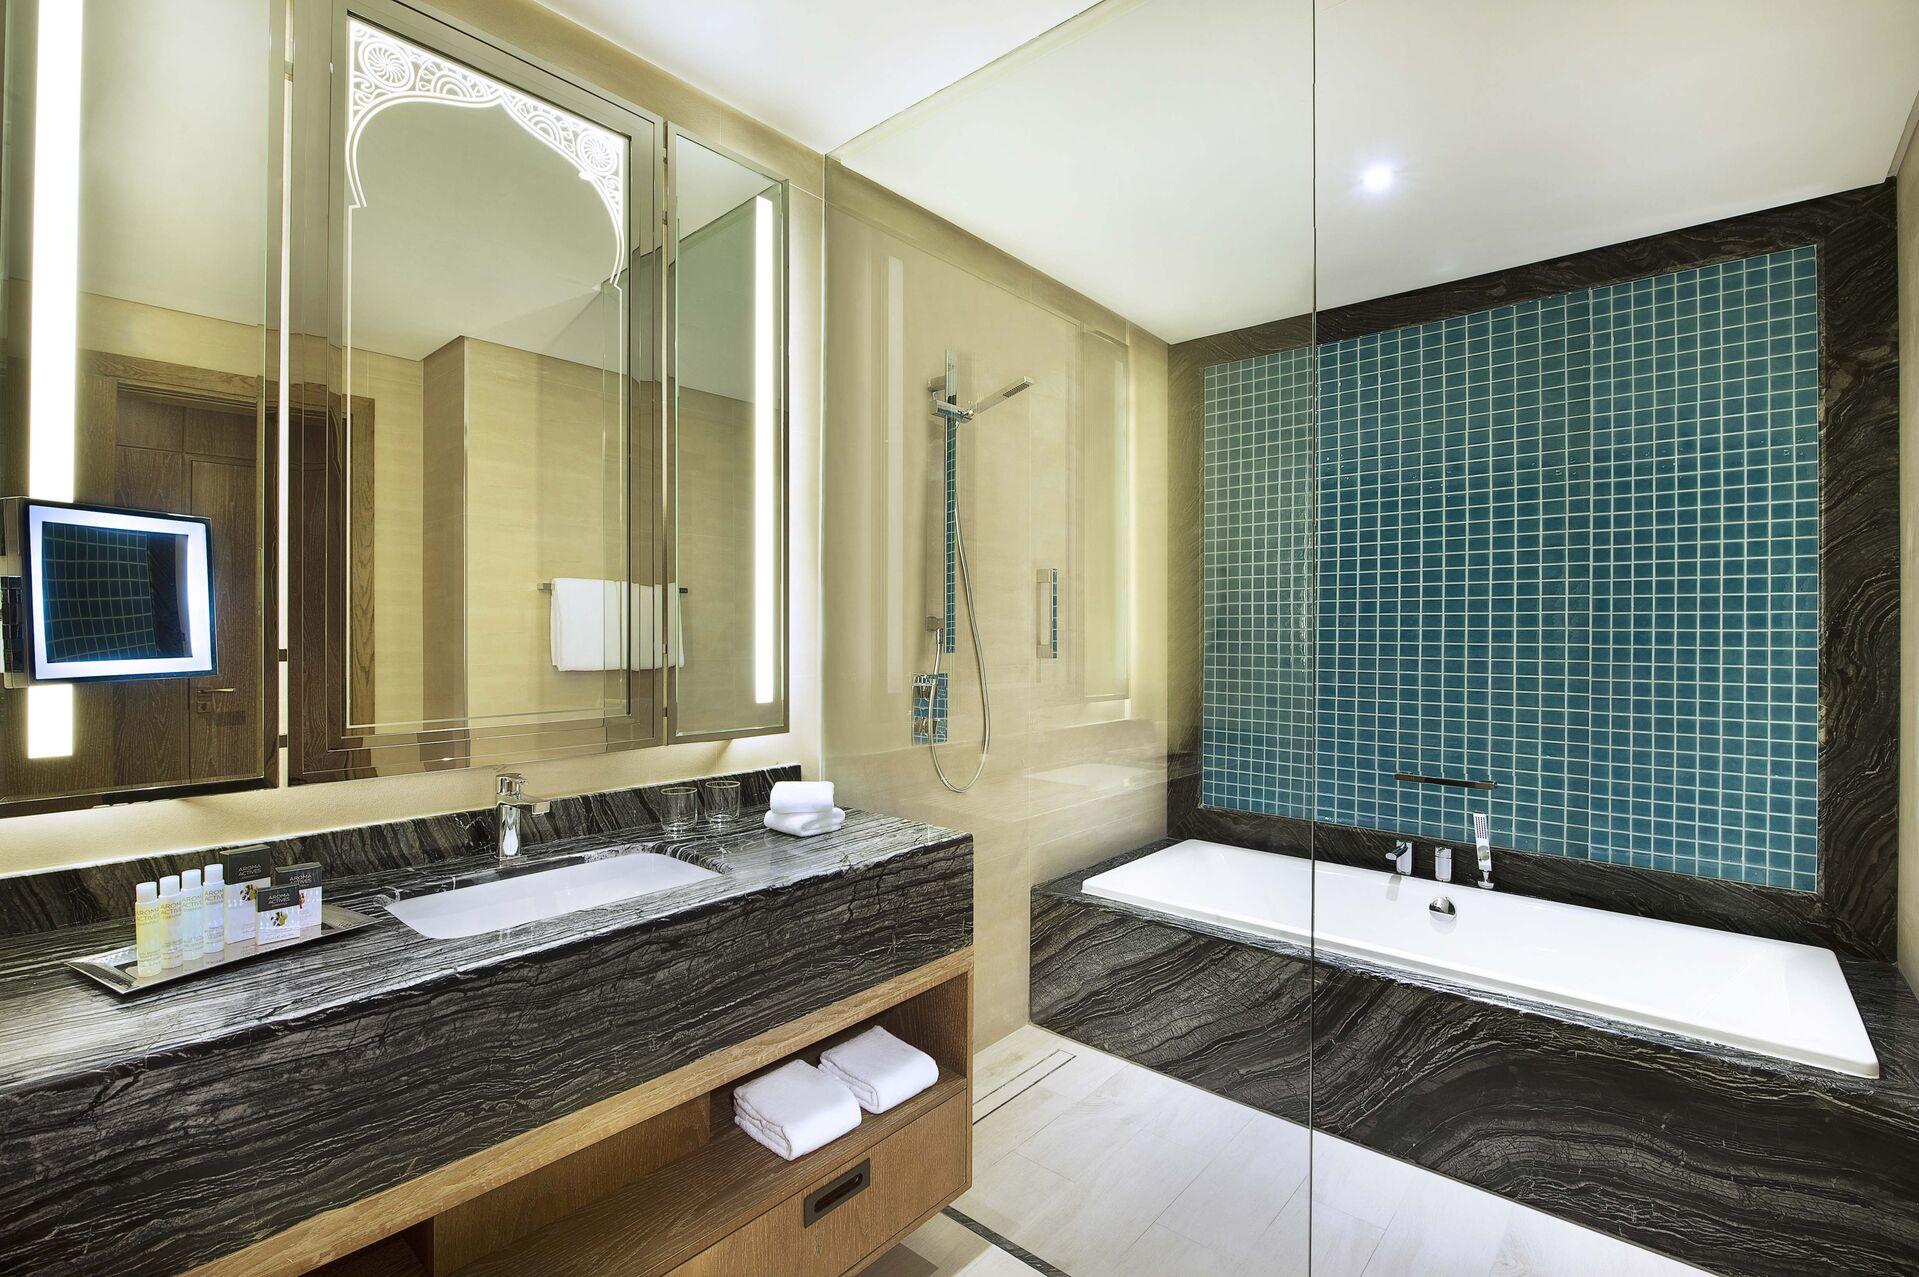 https://cms.satur.sk/data/imgs/tour_image/orig/bay-club-bathroom-1962585.jpg